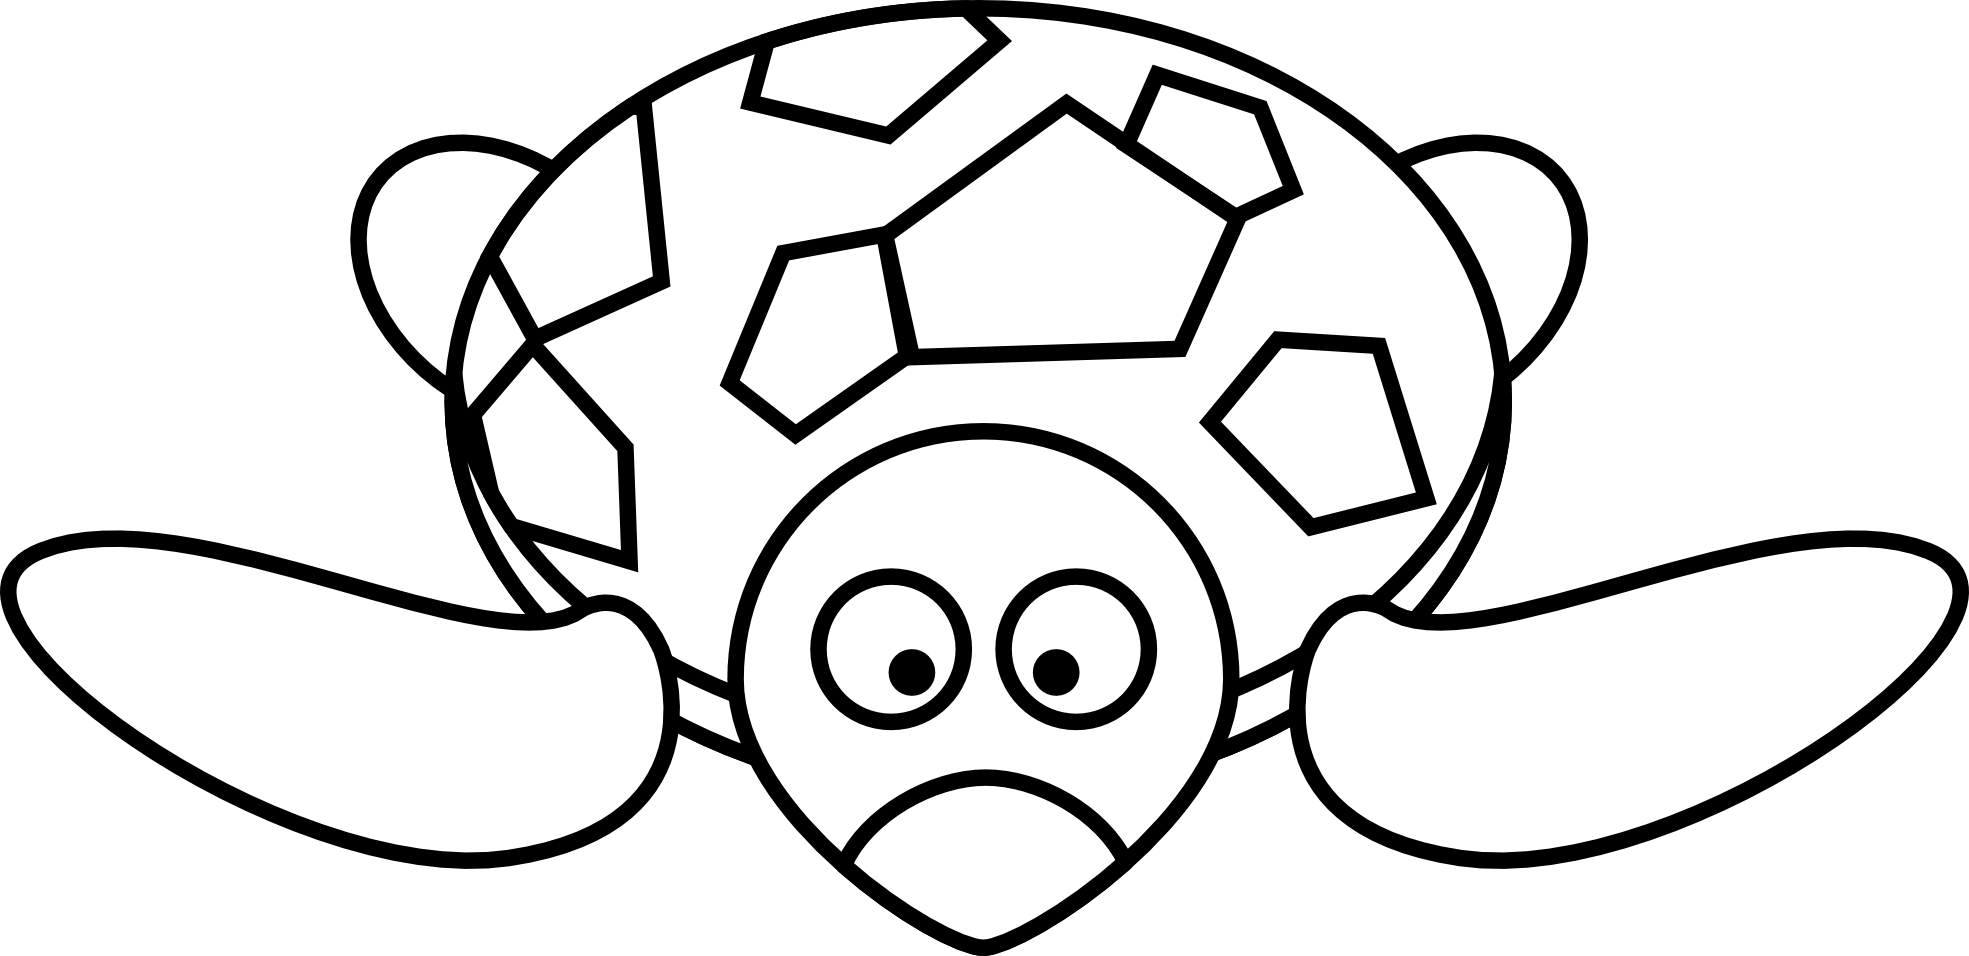 Tortoise Clipart Black And White Clipart Panda